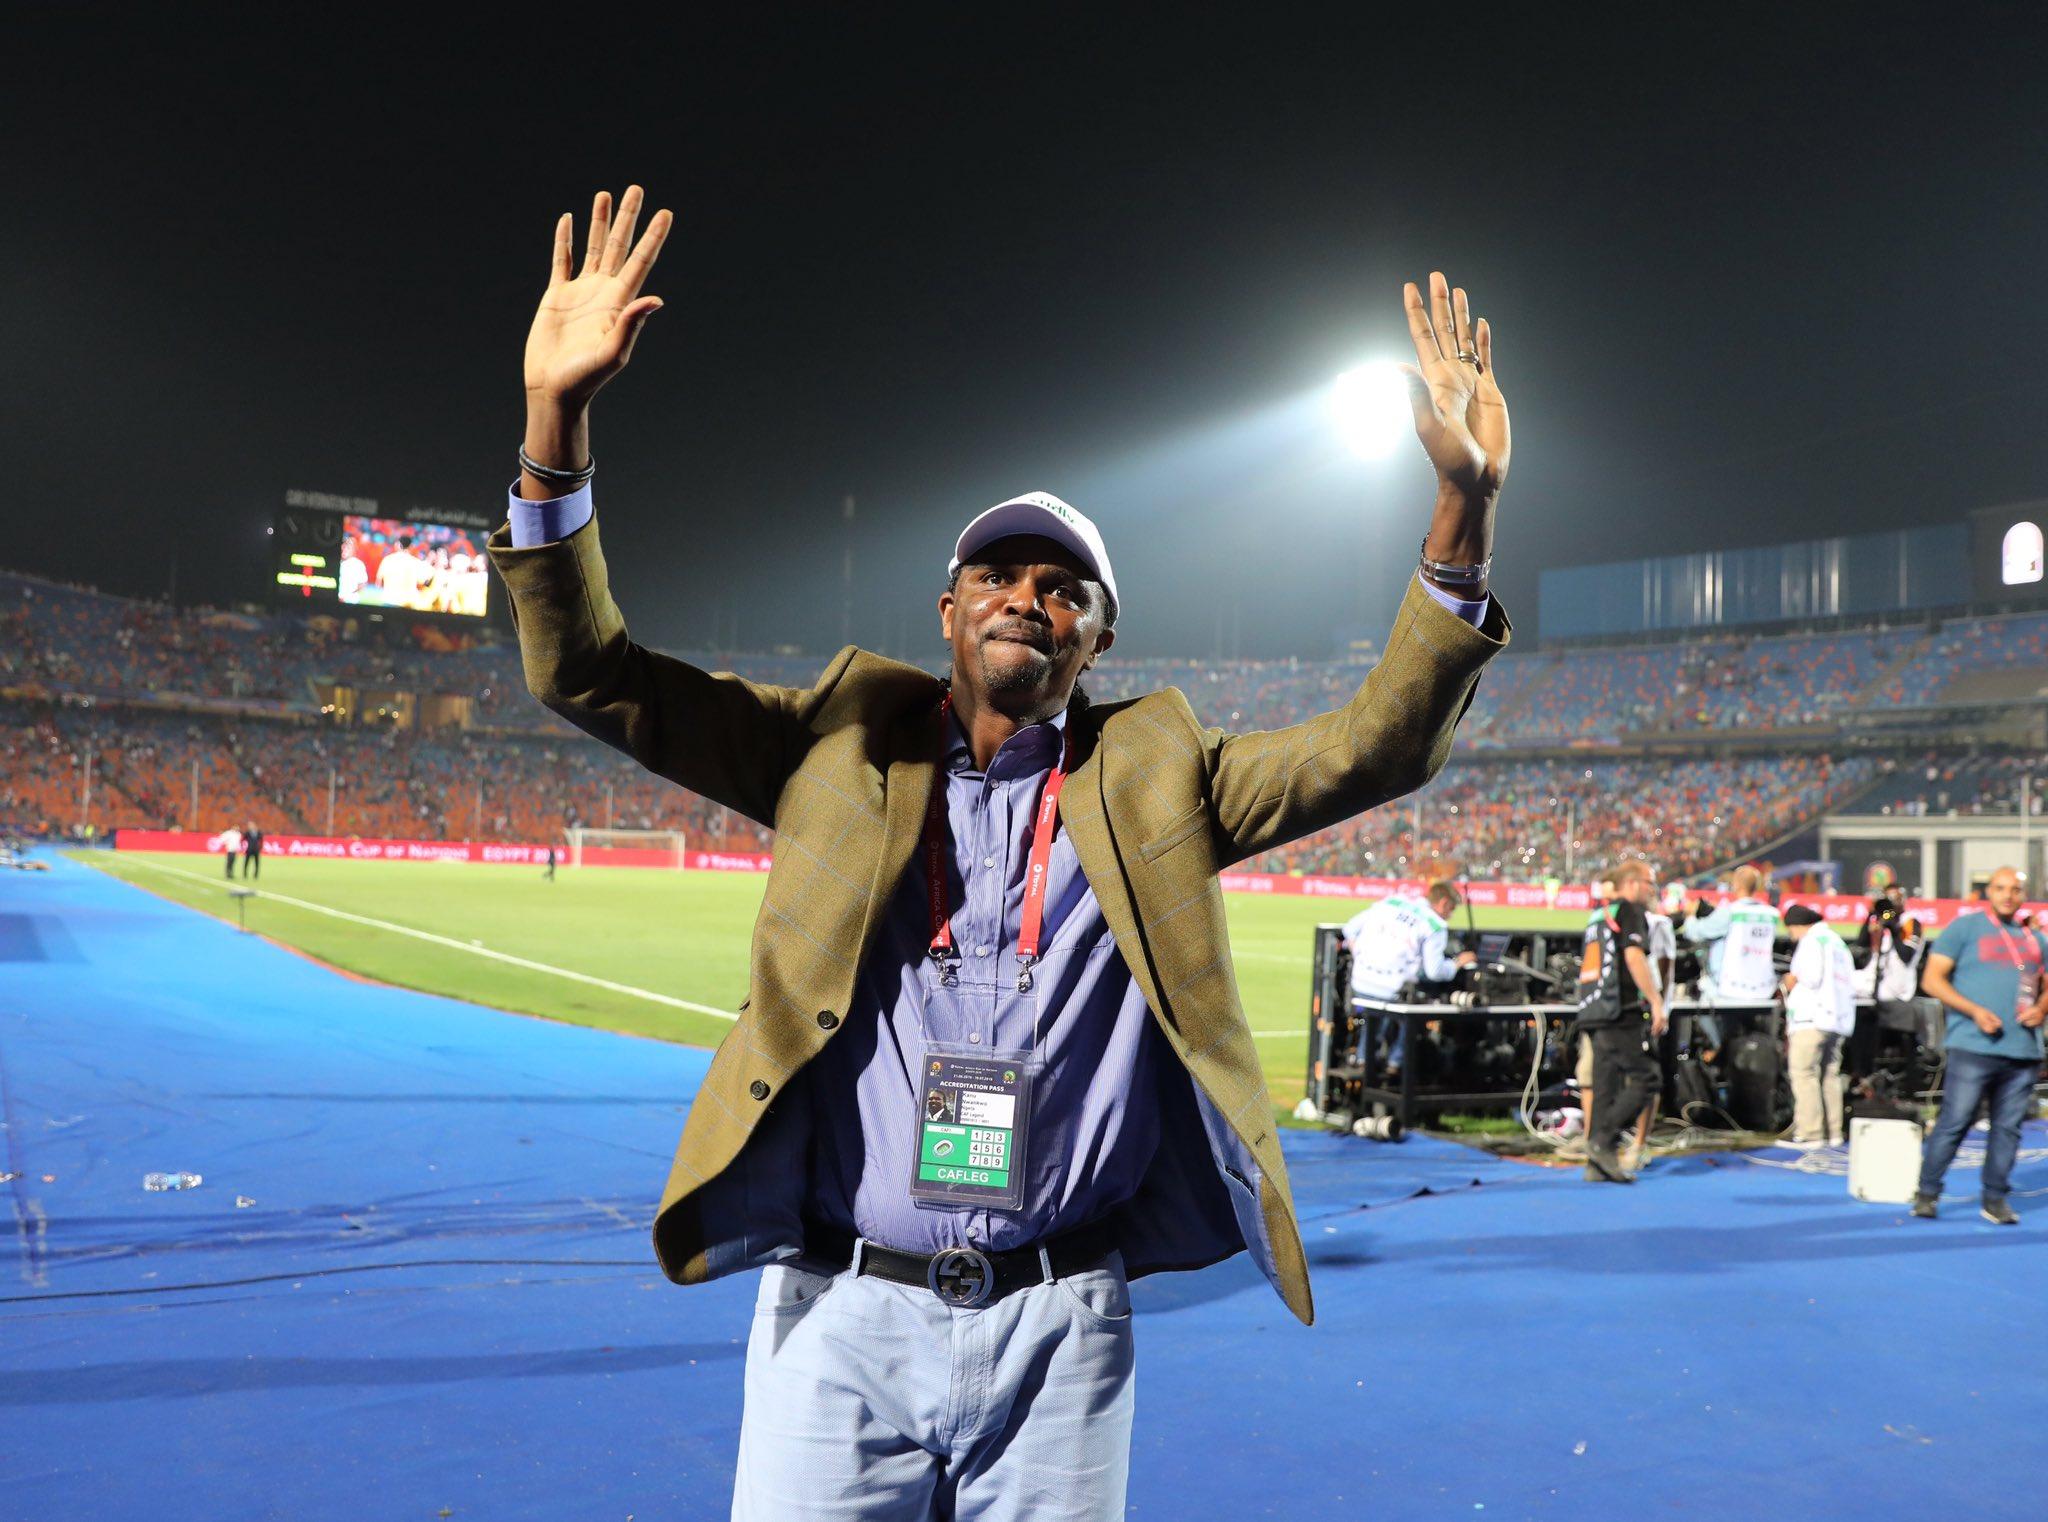 Nigerian football legend Nwankwo Kanu turns 44 today. Happy birthday legend.